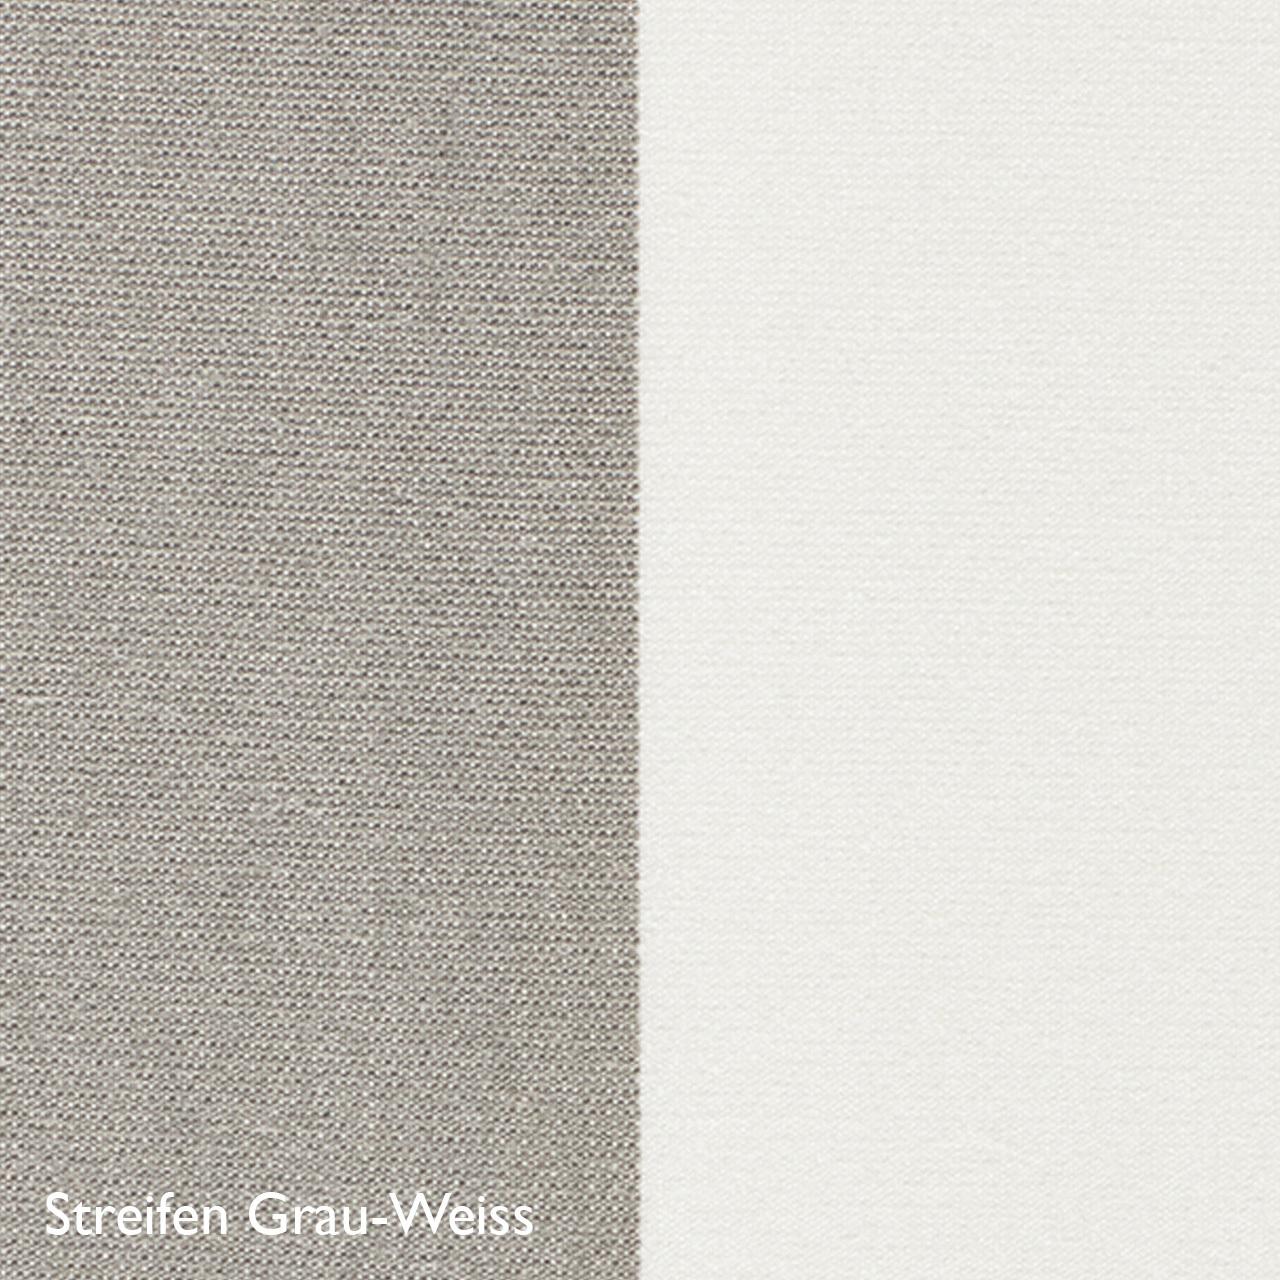 Weishäupl Farbkacheln Grau-Weiss